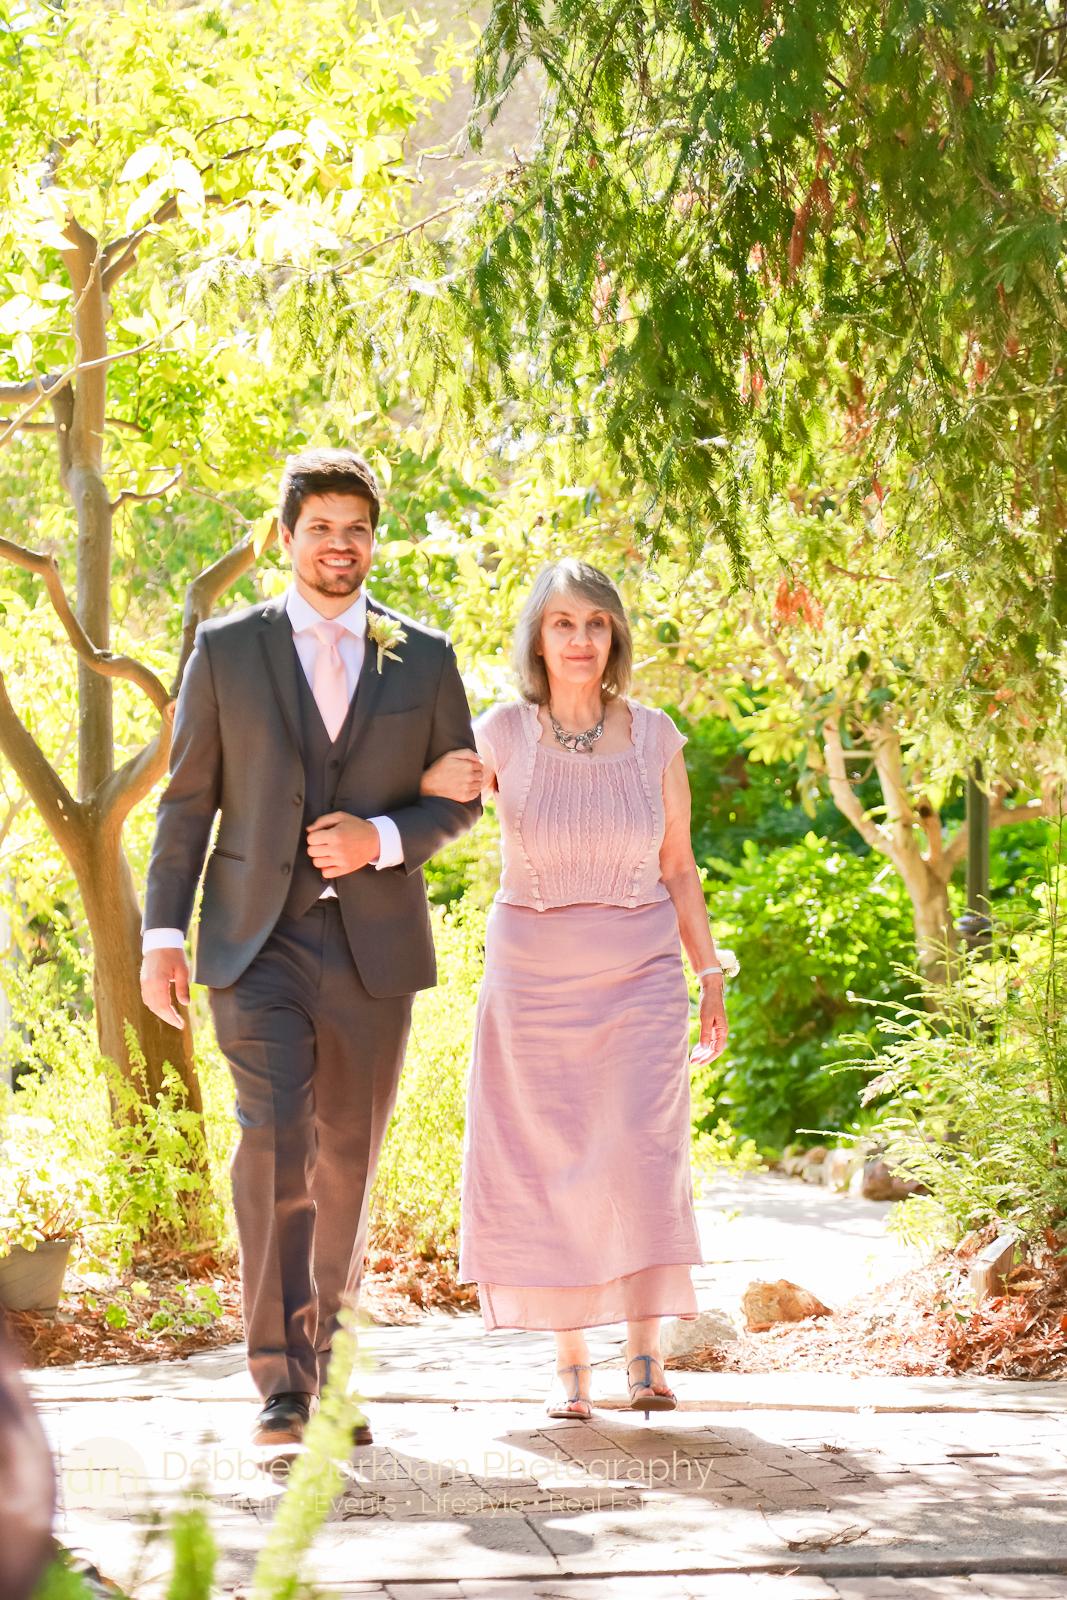 Debbie Markham Photography+Dalliedet House+San Luis Obispo+Garden Wedding+Fall Season-5236